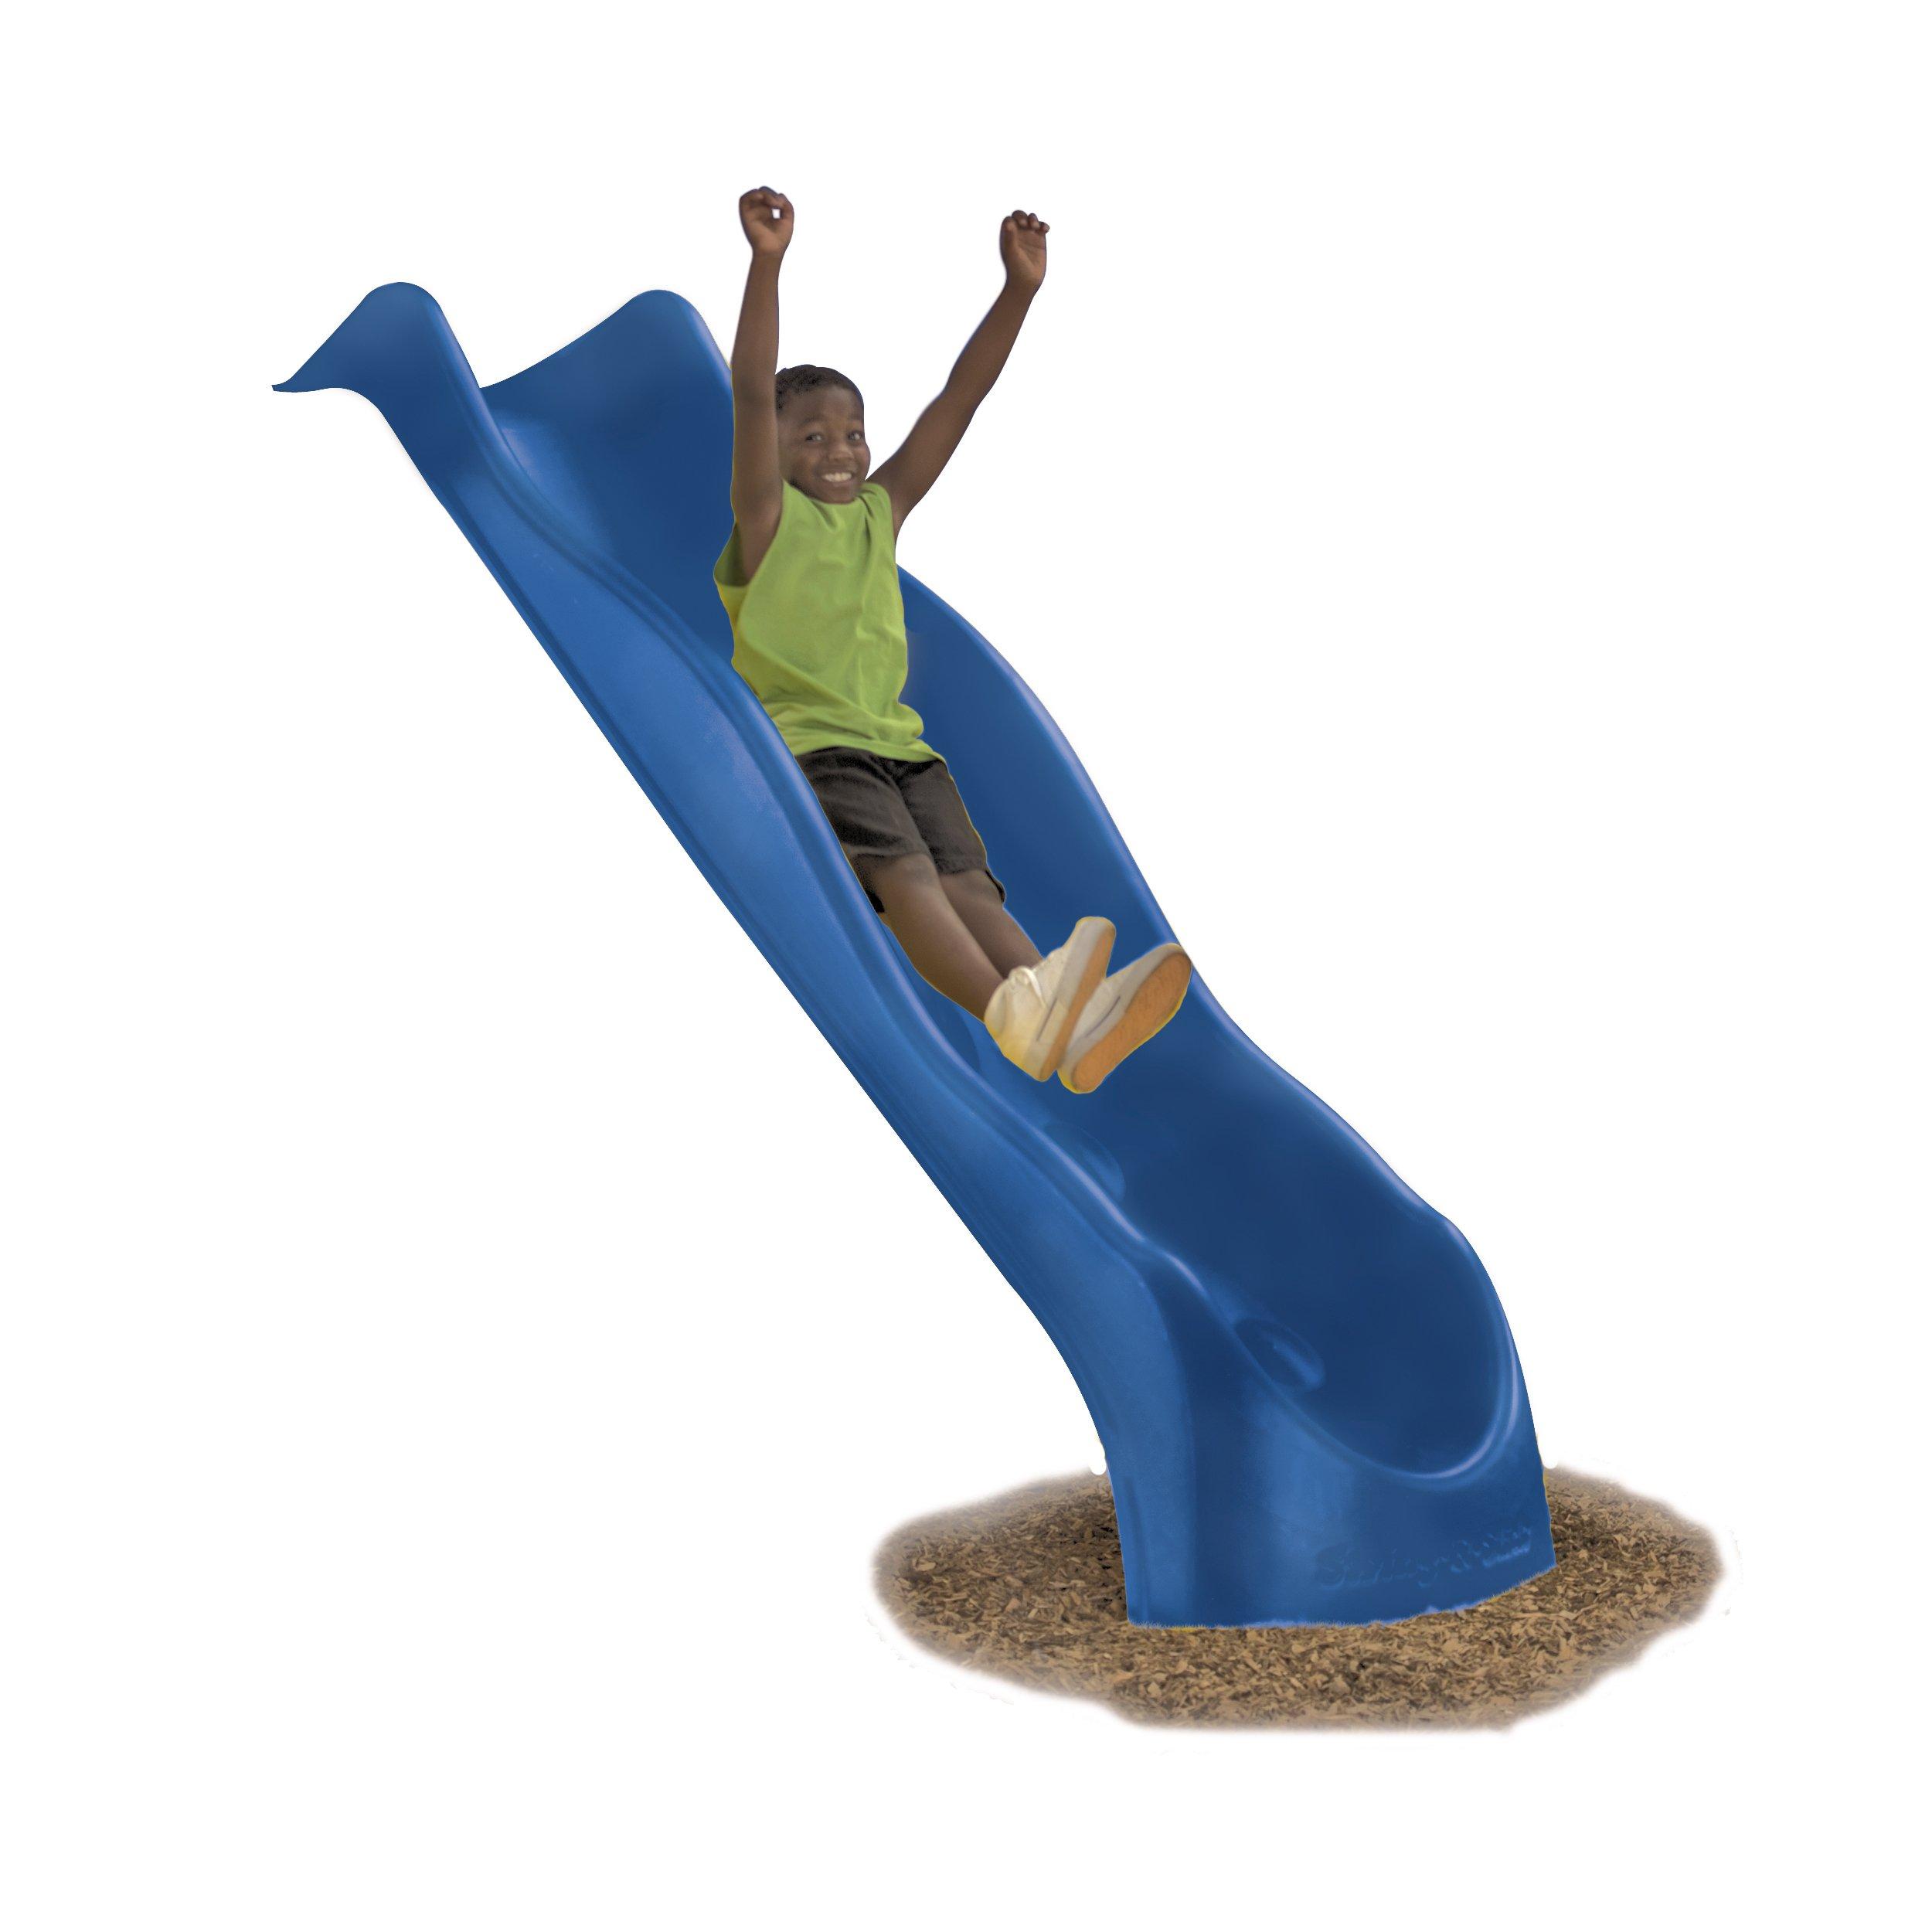 Swing-N-Slide NE 3054 Speedwave Slide Plastic Slide for 4' Decks with, Blue by Swing-N-Slide (Image #1)